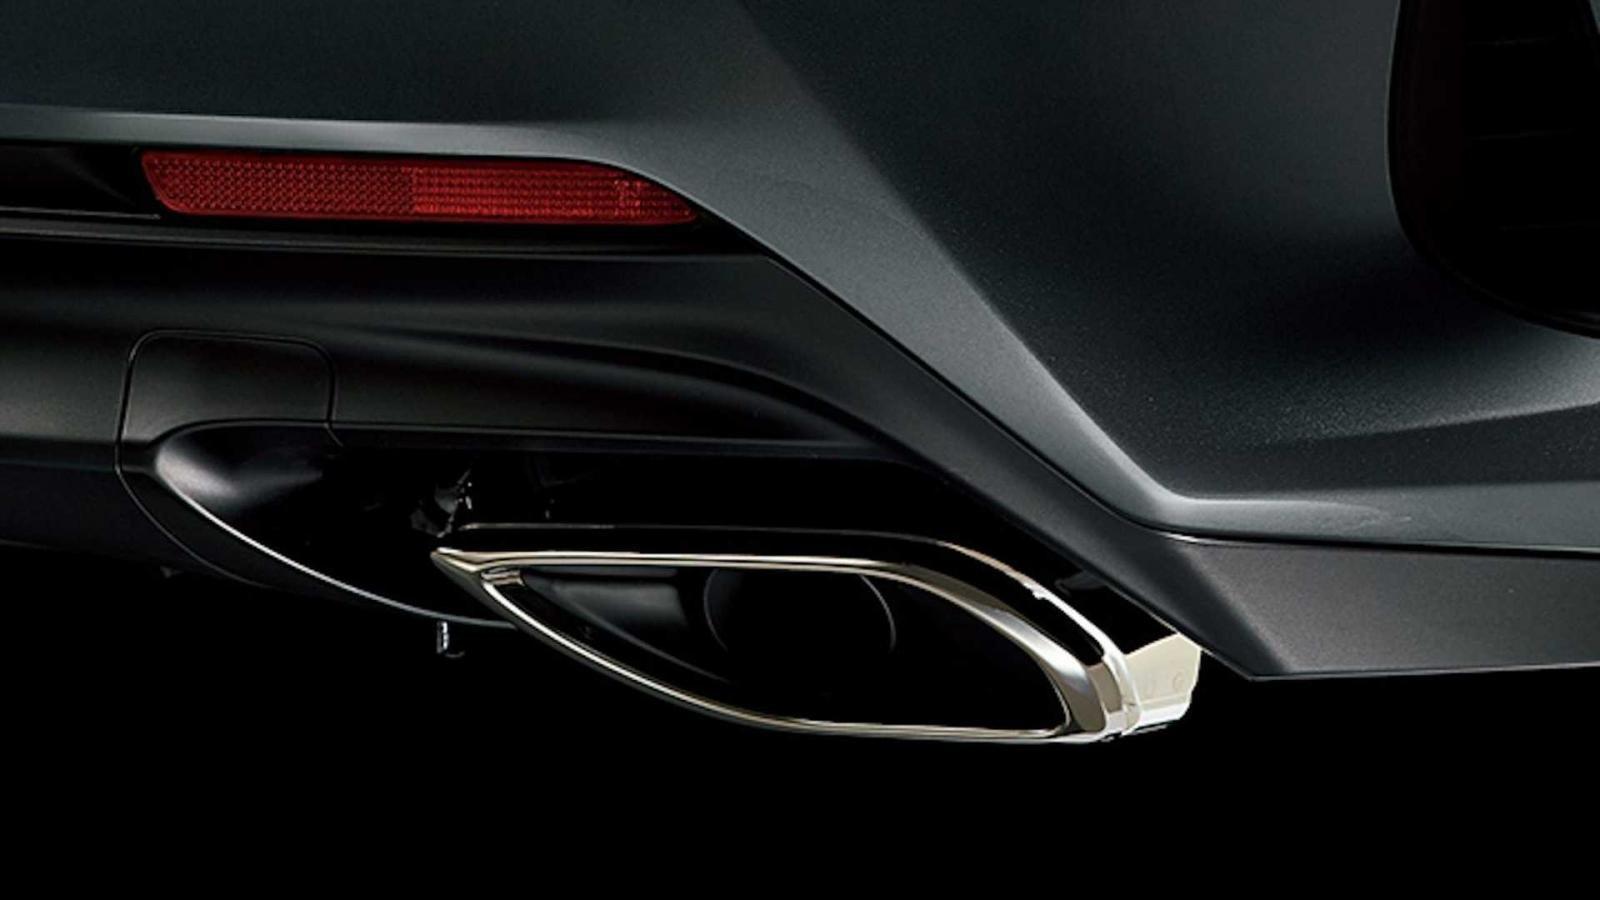 Lexus RC Emotional Ash Edition ngoại thất - 4.